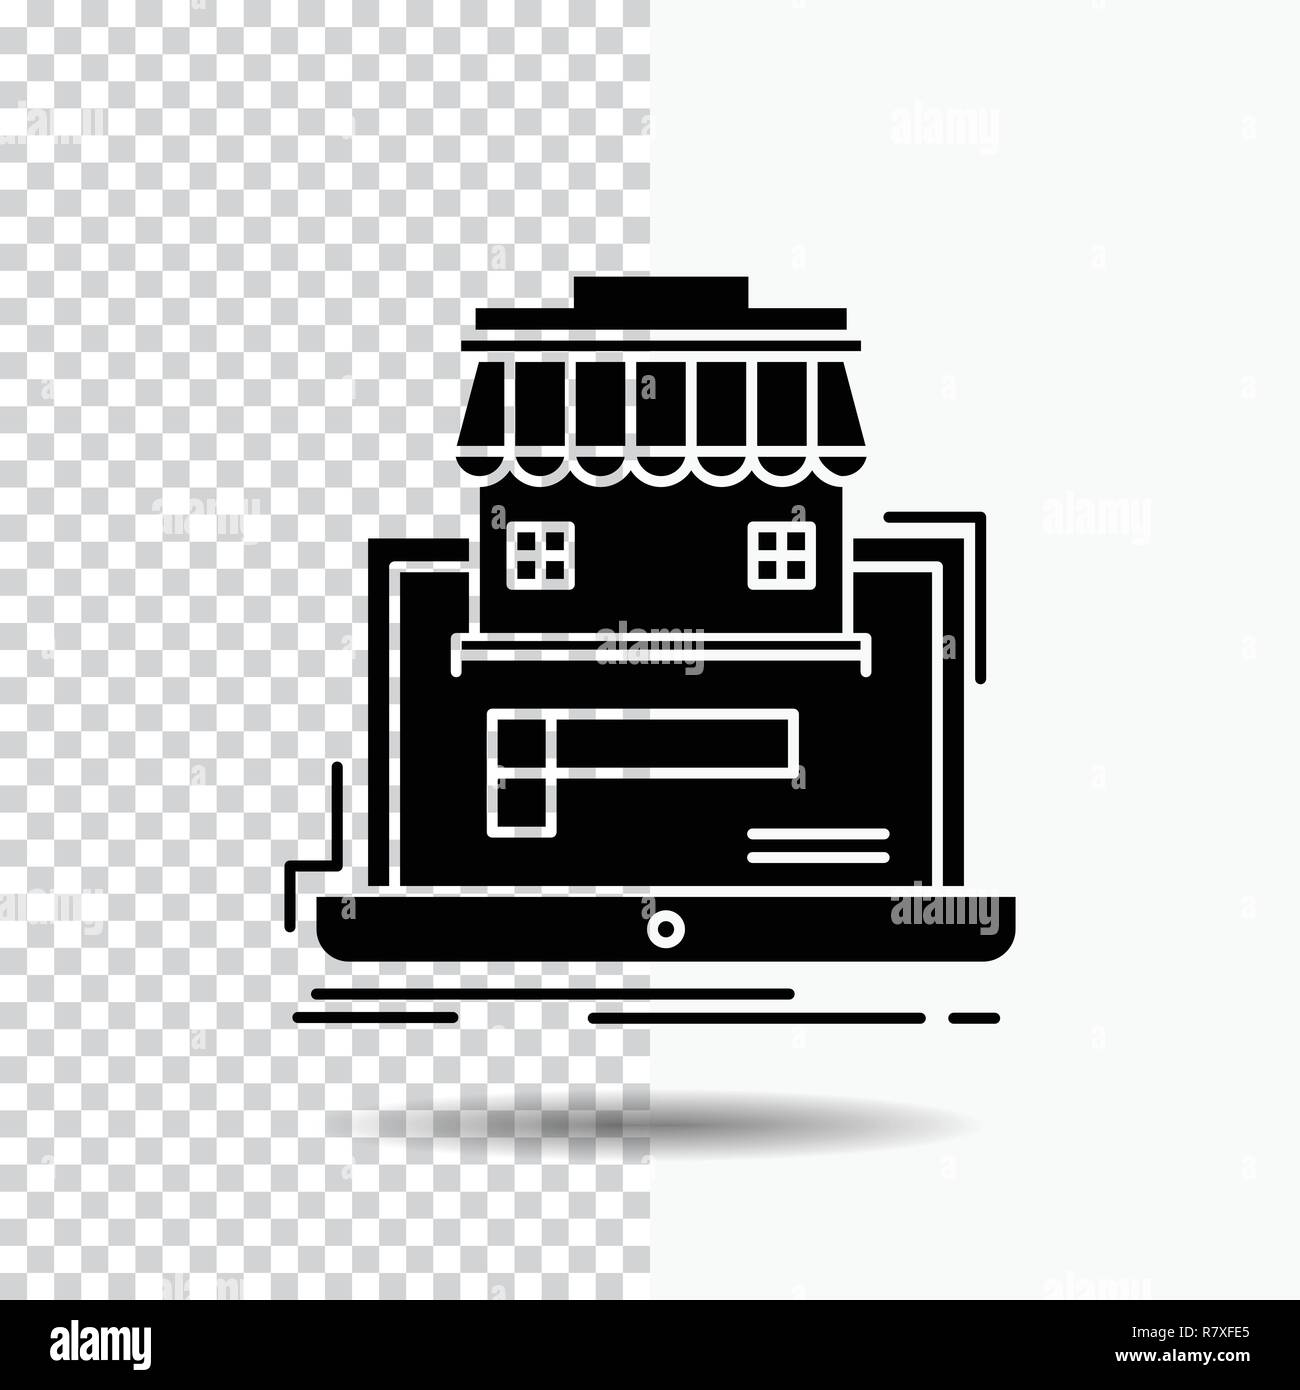 Business Marketplace Organization Data Online Market Glyph Icon On Transparent Background Black Icon Stock Vector Image Art Alamy